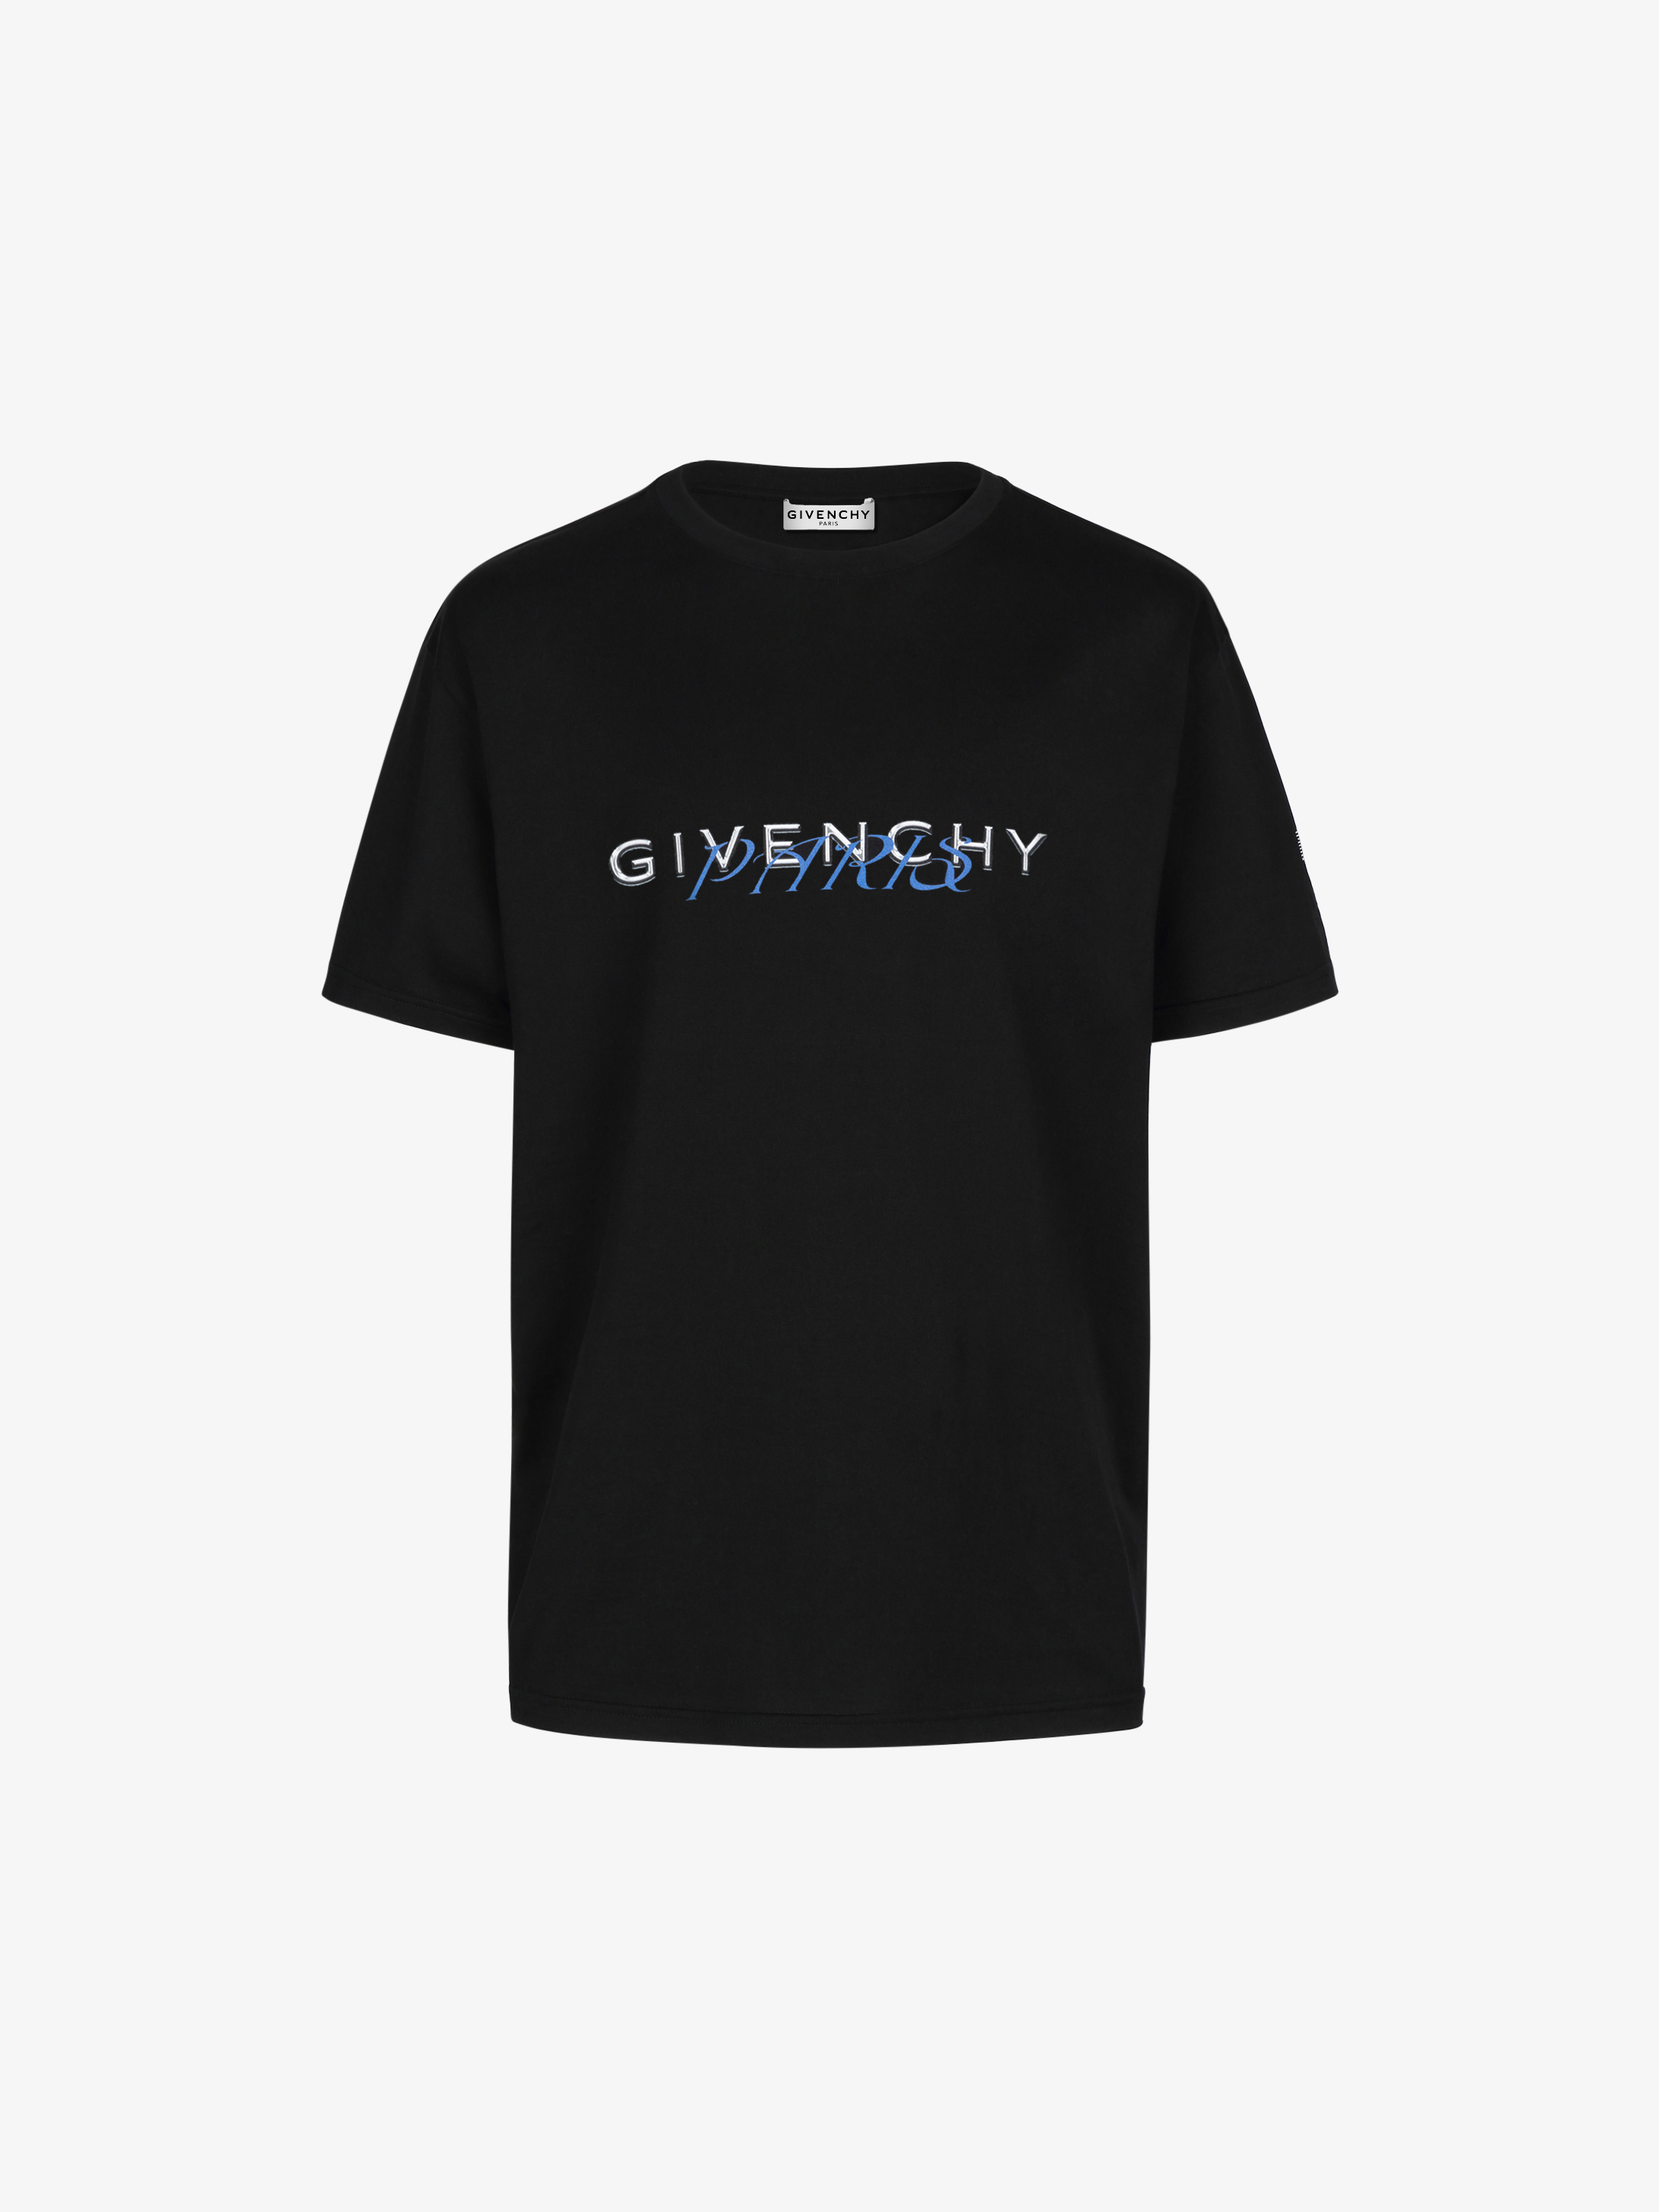 GIVENCHY PARIS calligraphic printed t-shirt